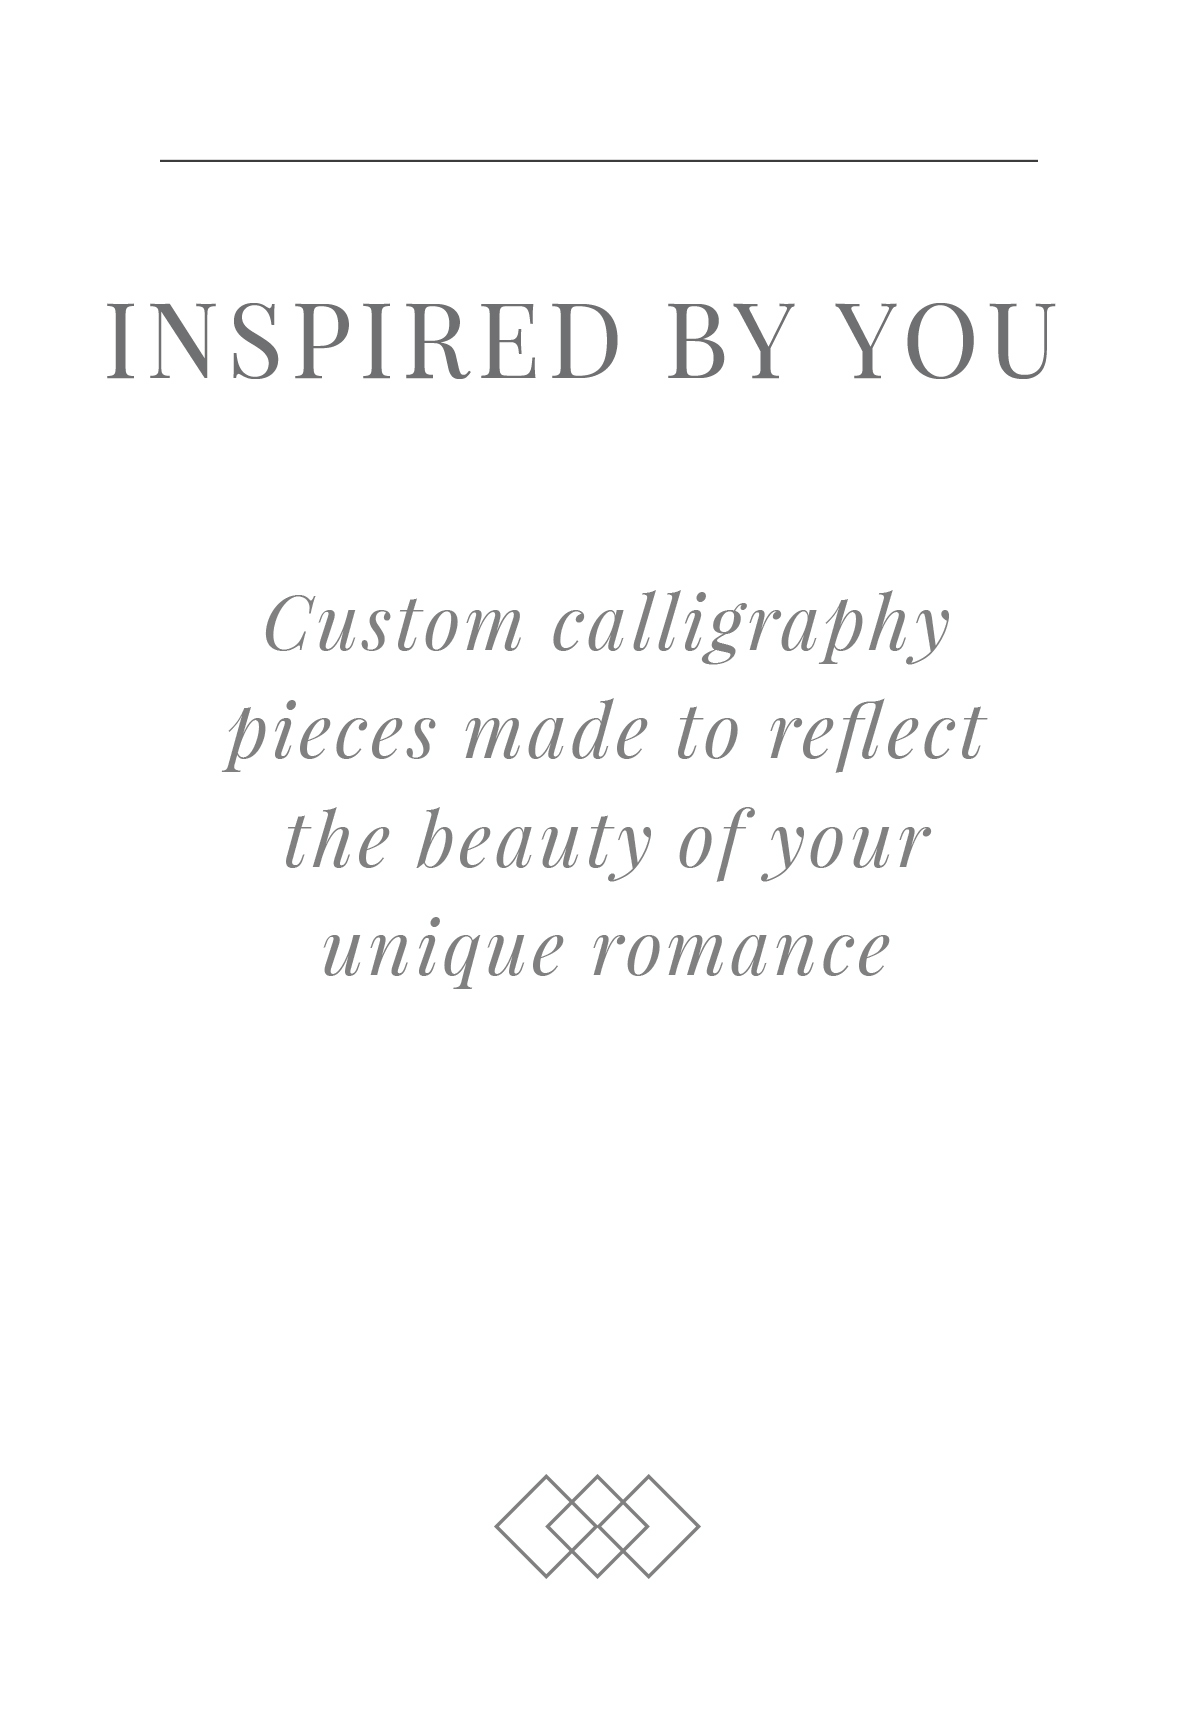 CustomCalligraphyBespokeStrokesCalligraphy